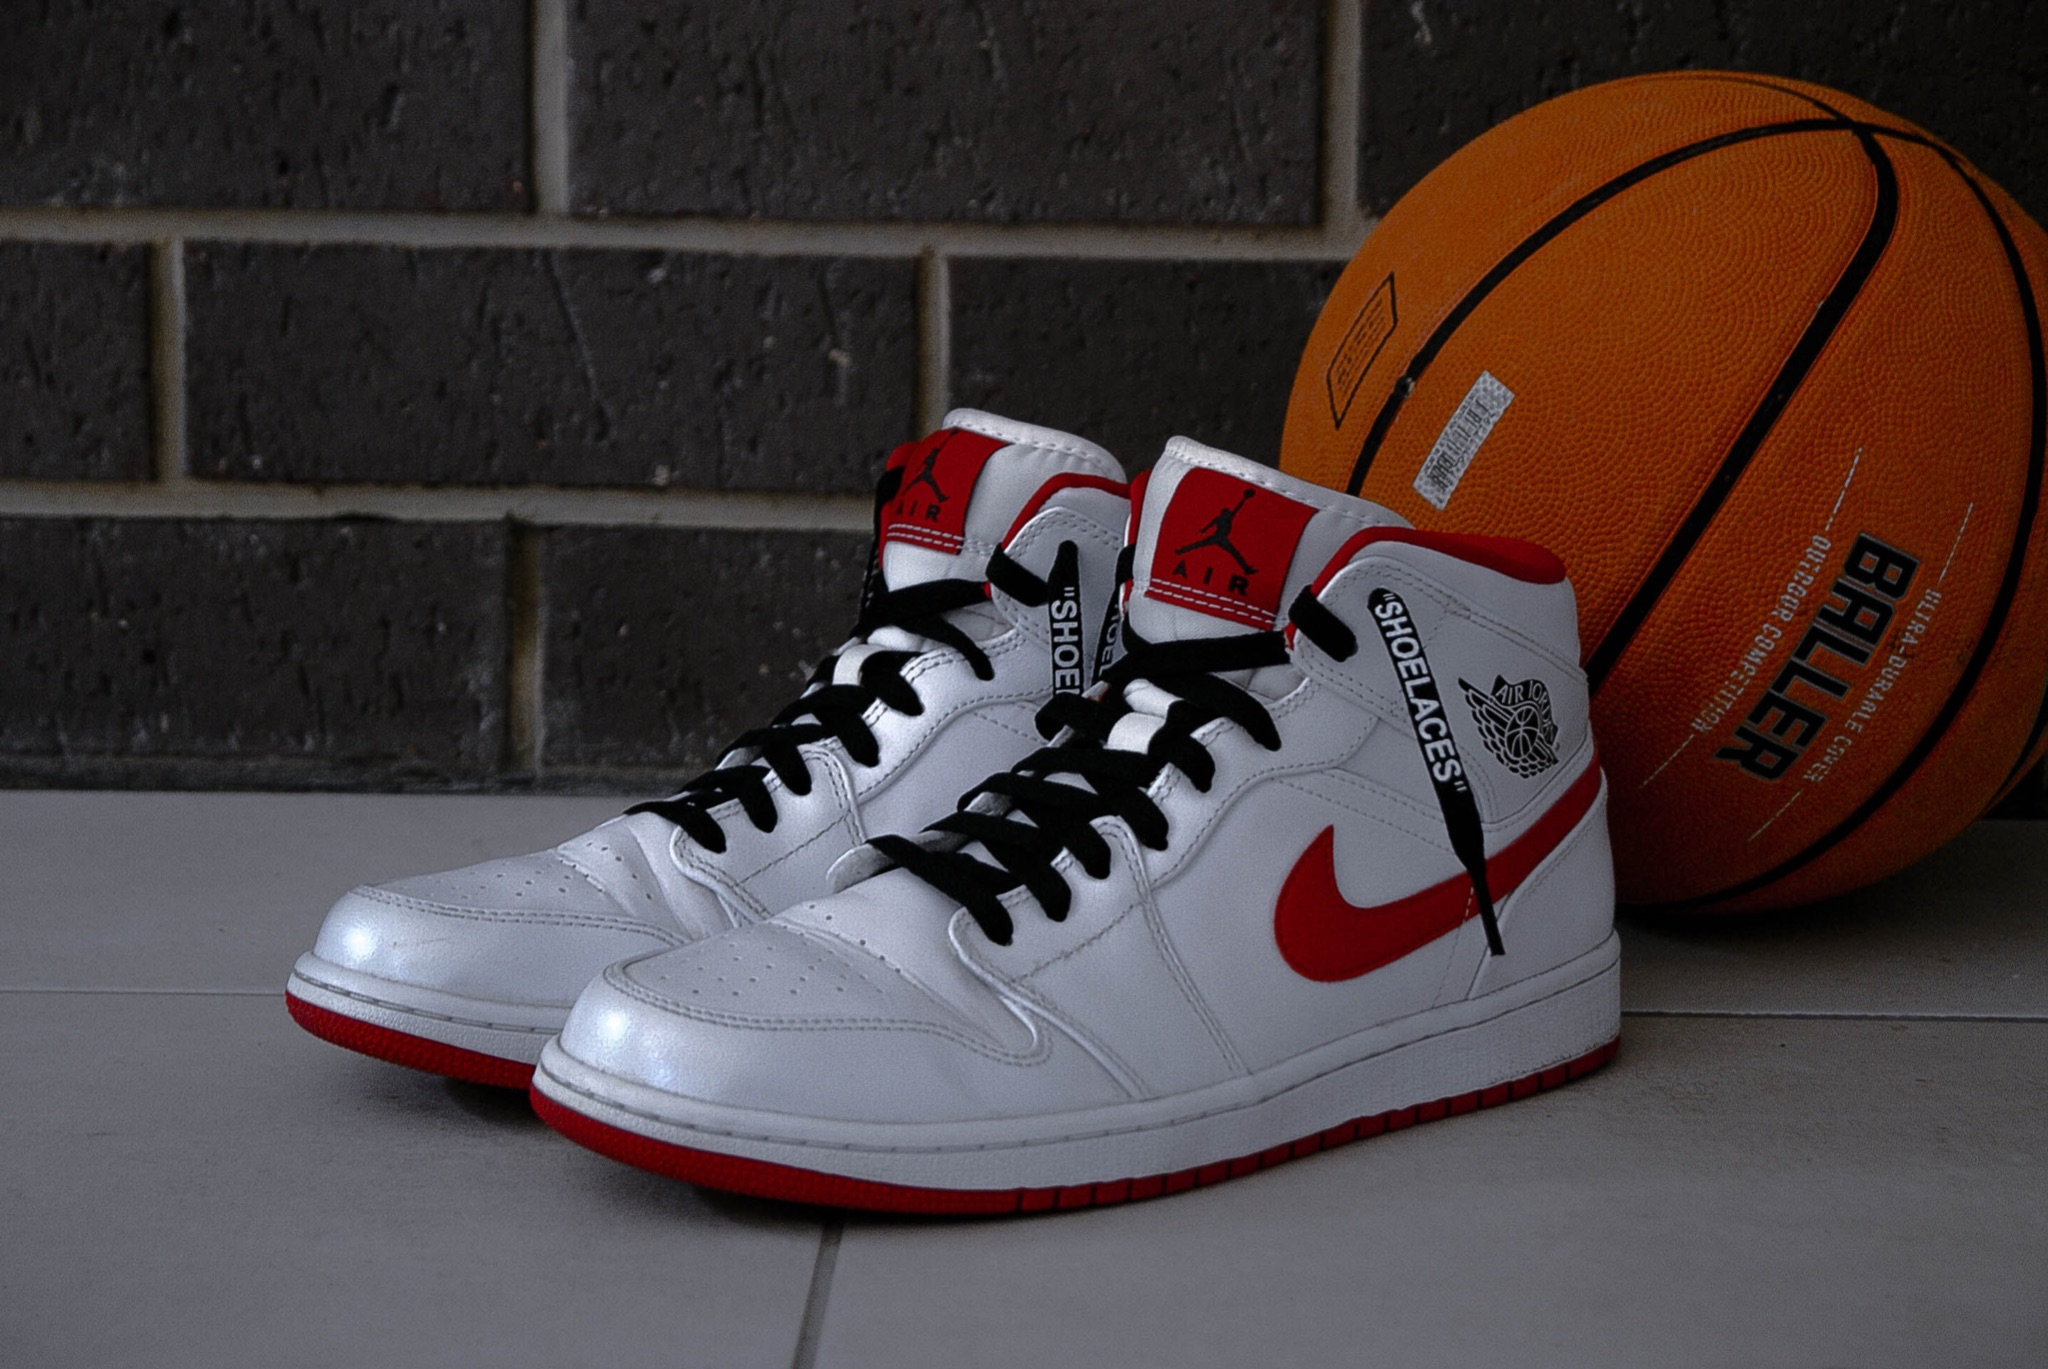 Air Jordan 1 White/Red